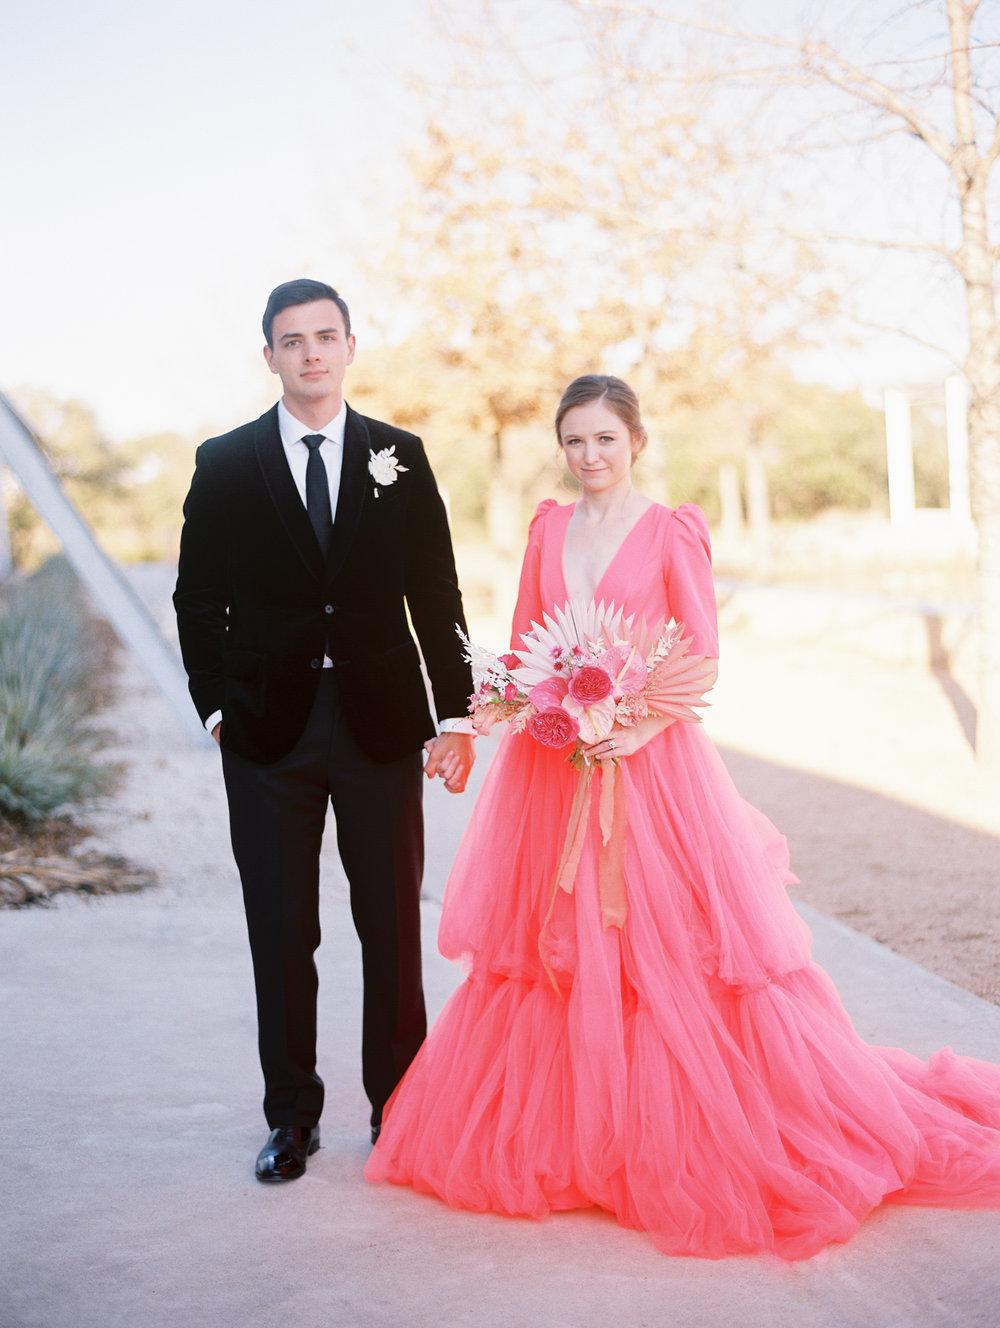 Kristin-La-Voie-Photography-Austin-Wedding-Photographer-Prospect-House-10.jpg